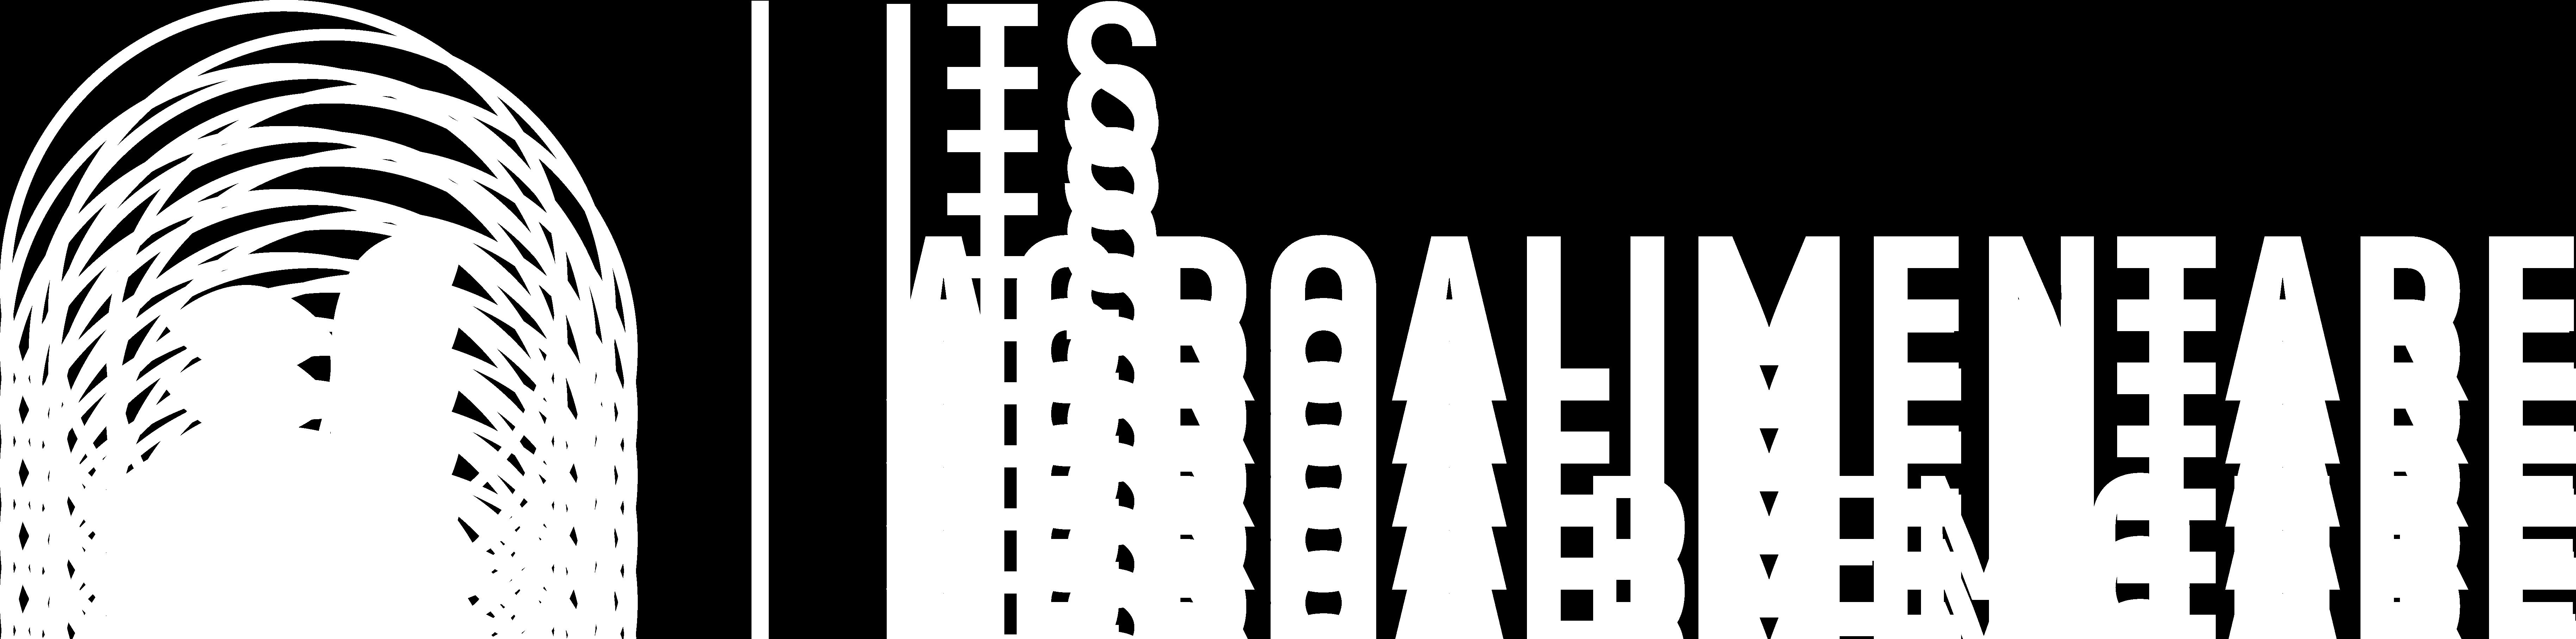 logo-its-agroalimentare-piemonte-white